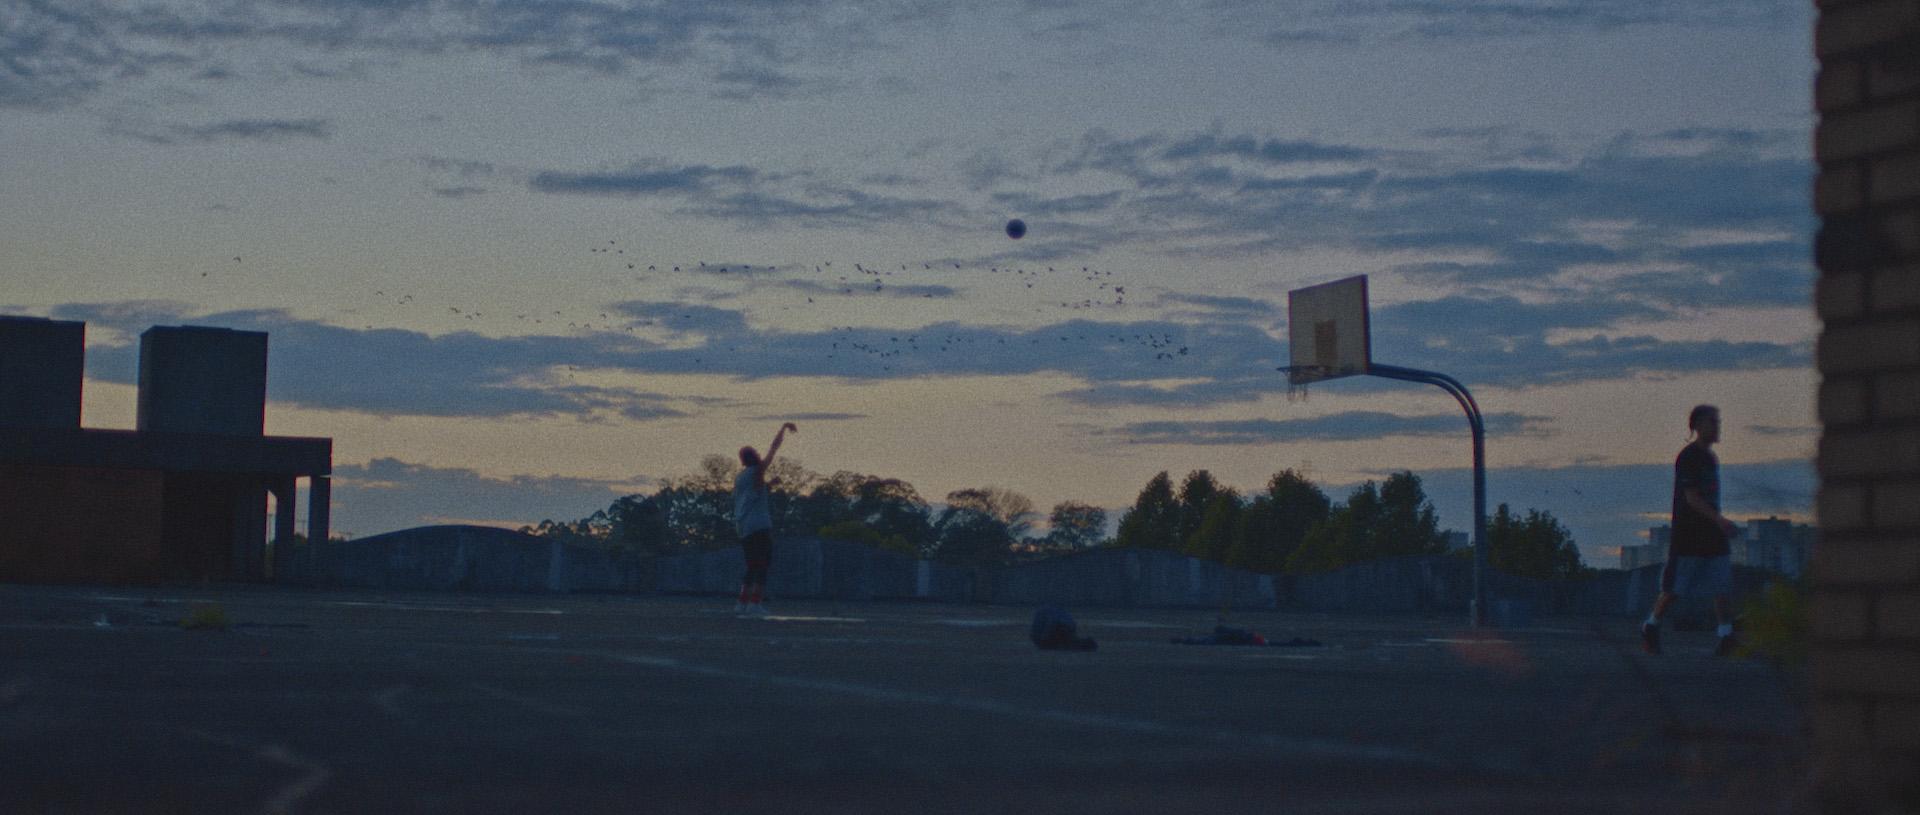 BUD_NBA_Frames03.jpg